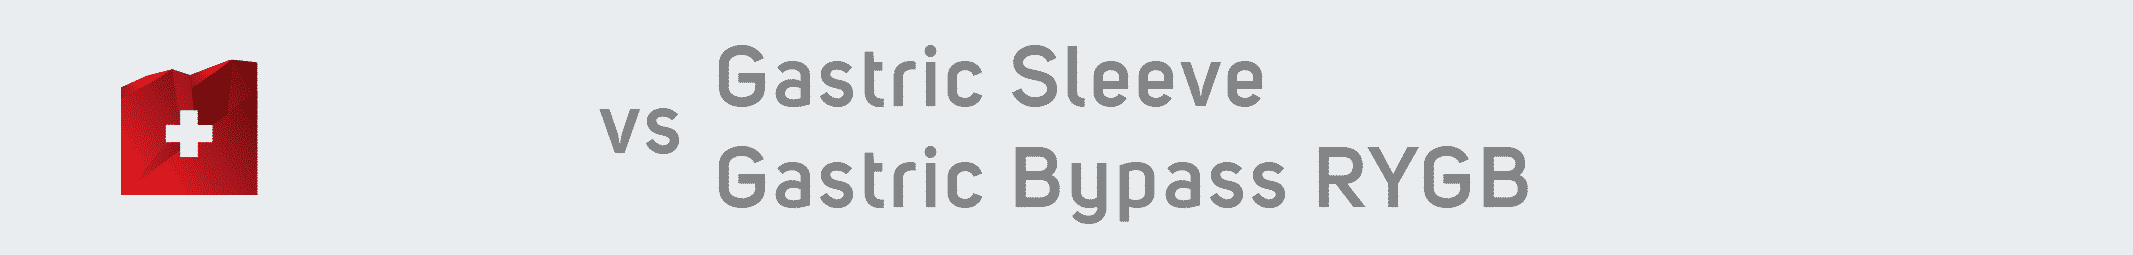 banner gastric sleeve vs gastric bypass